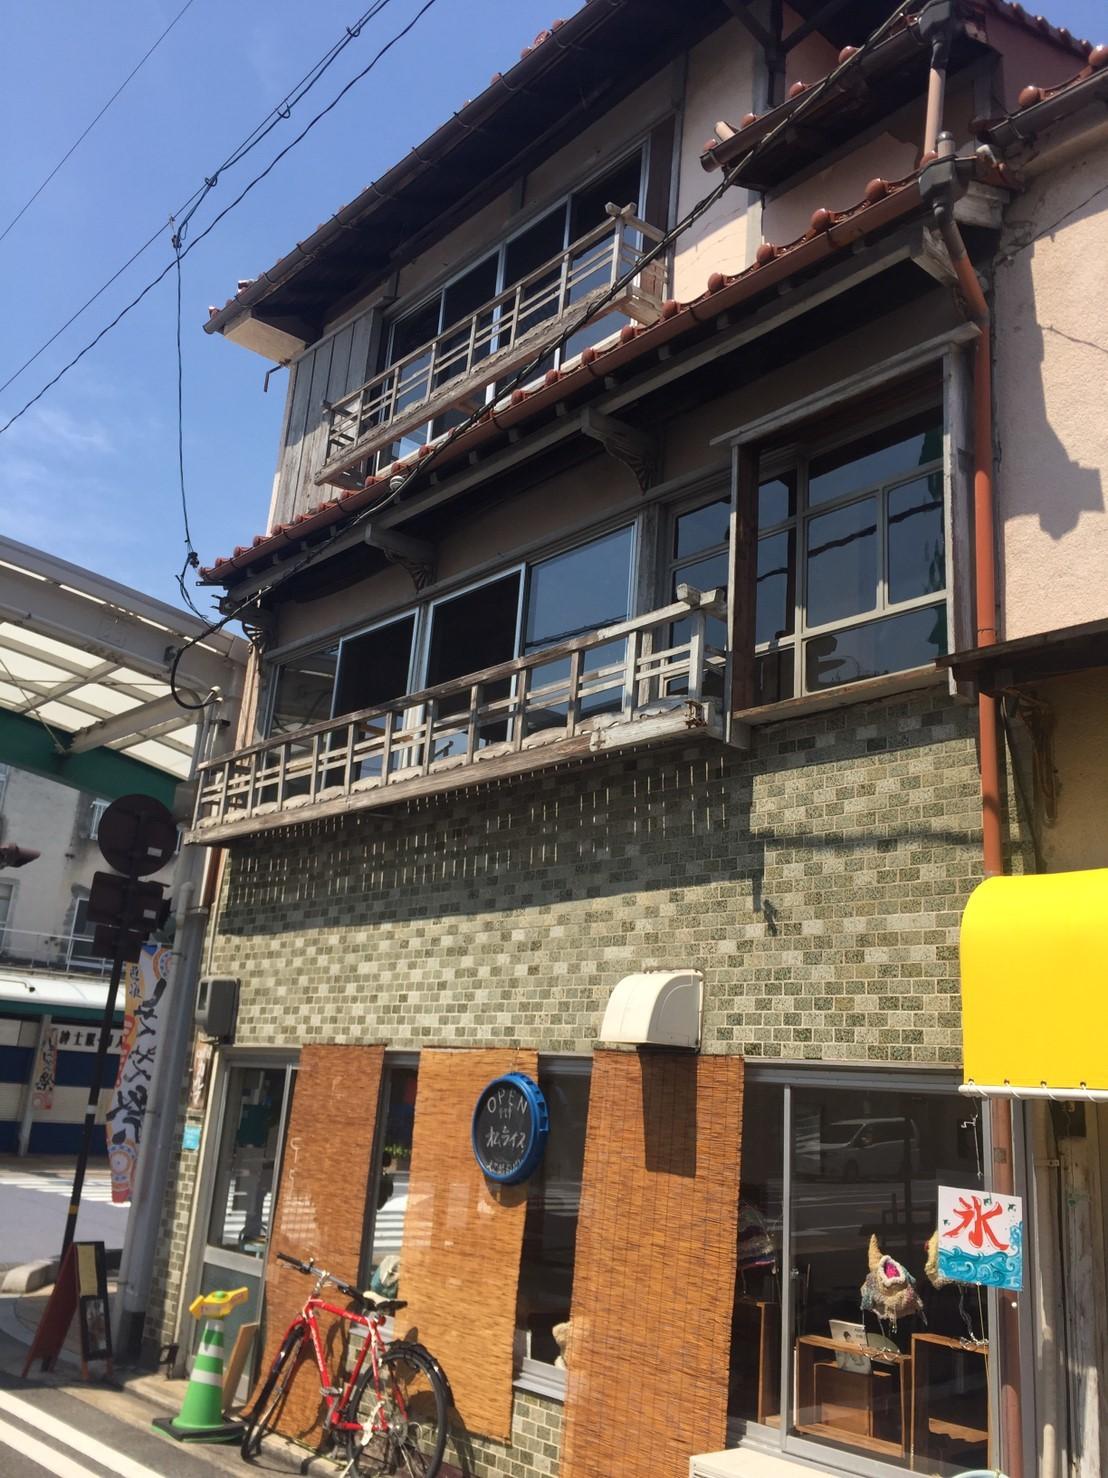 Tottori カルマ  カルマ焼飯_e0115904_15445693.jpg